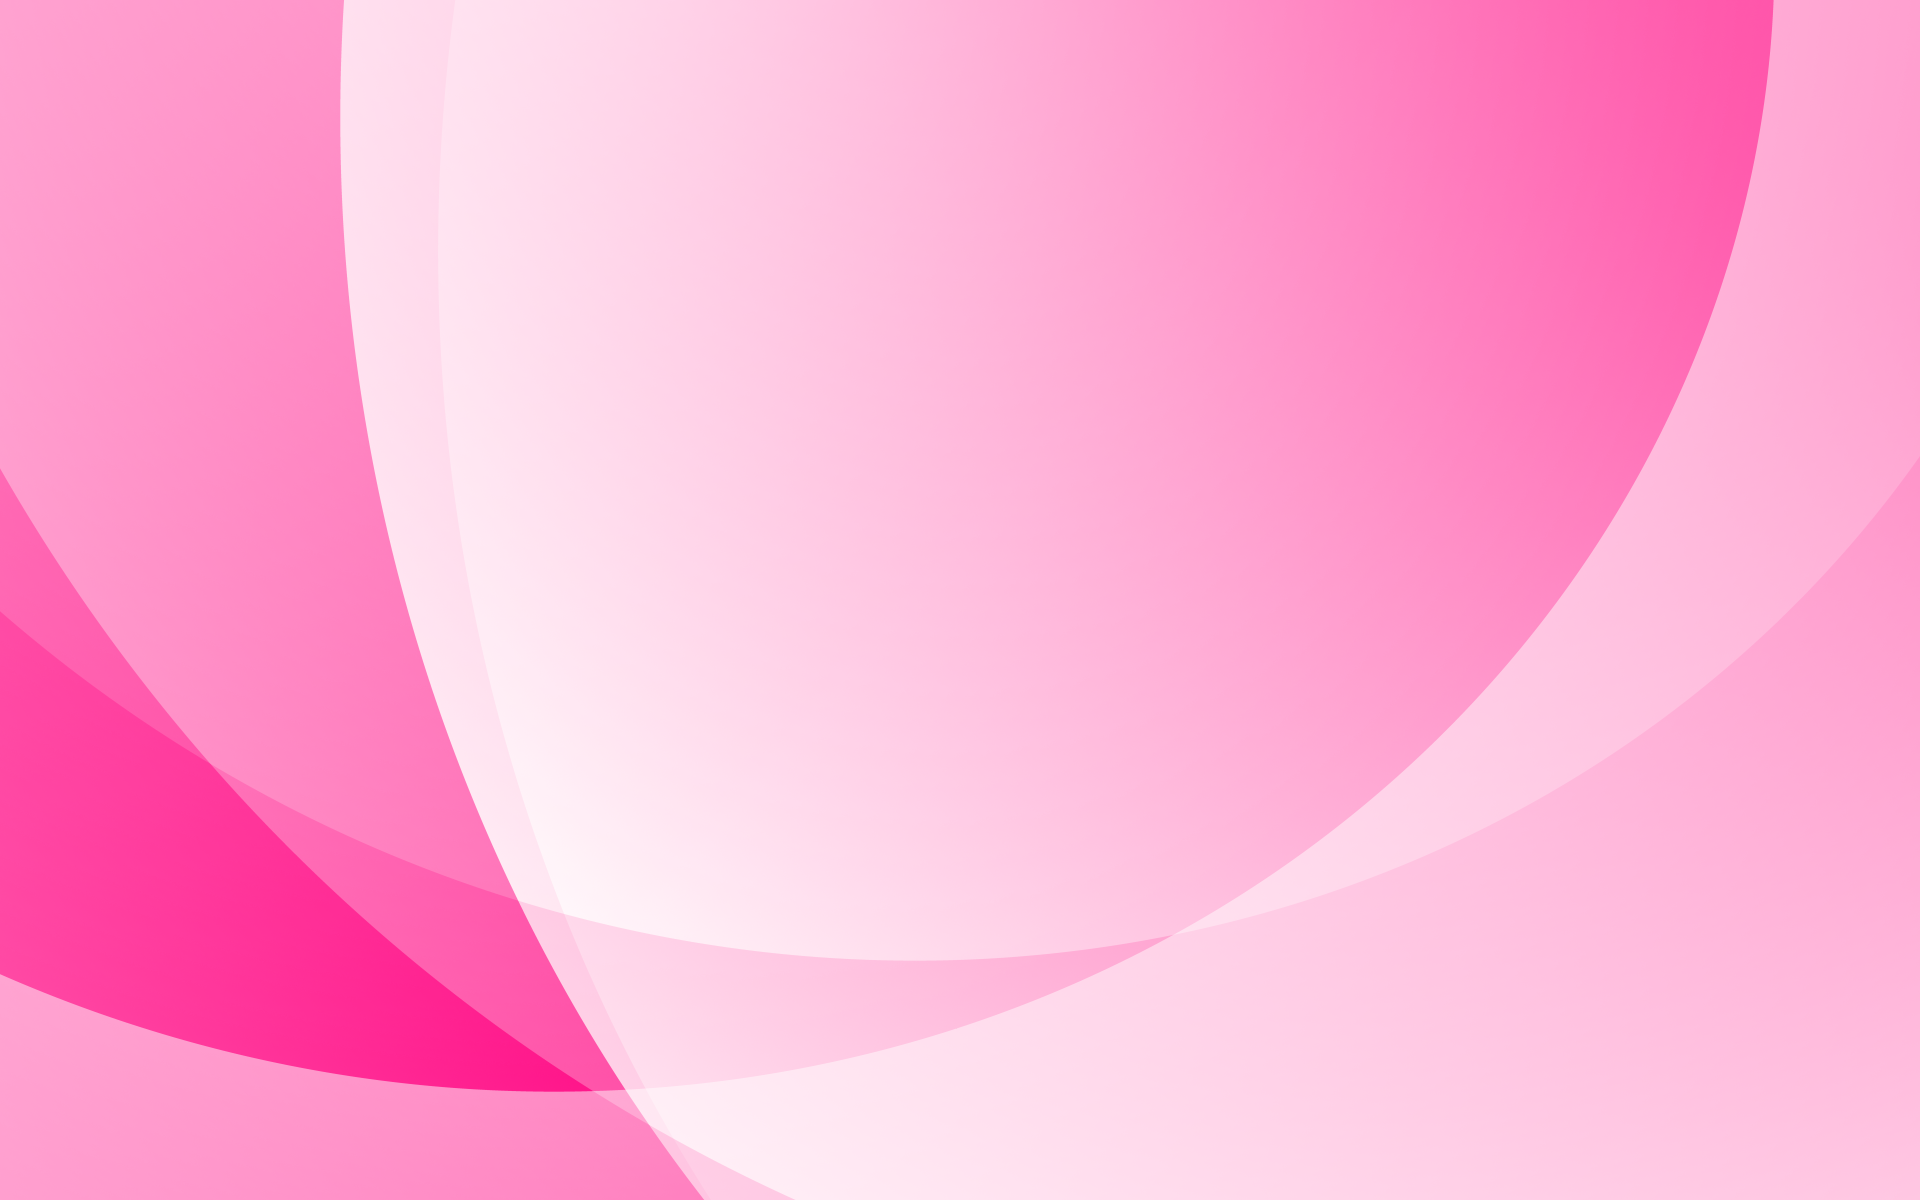 Light Pink Abstract Wallpaper. img Pinterest Pink